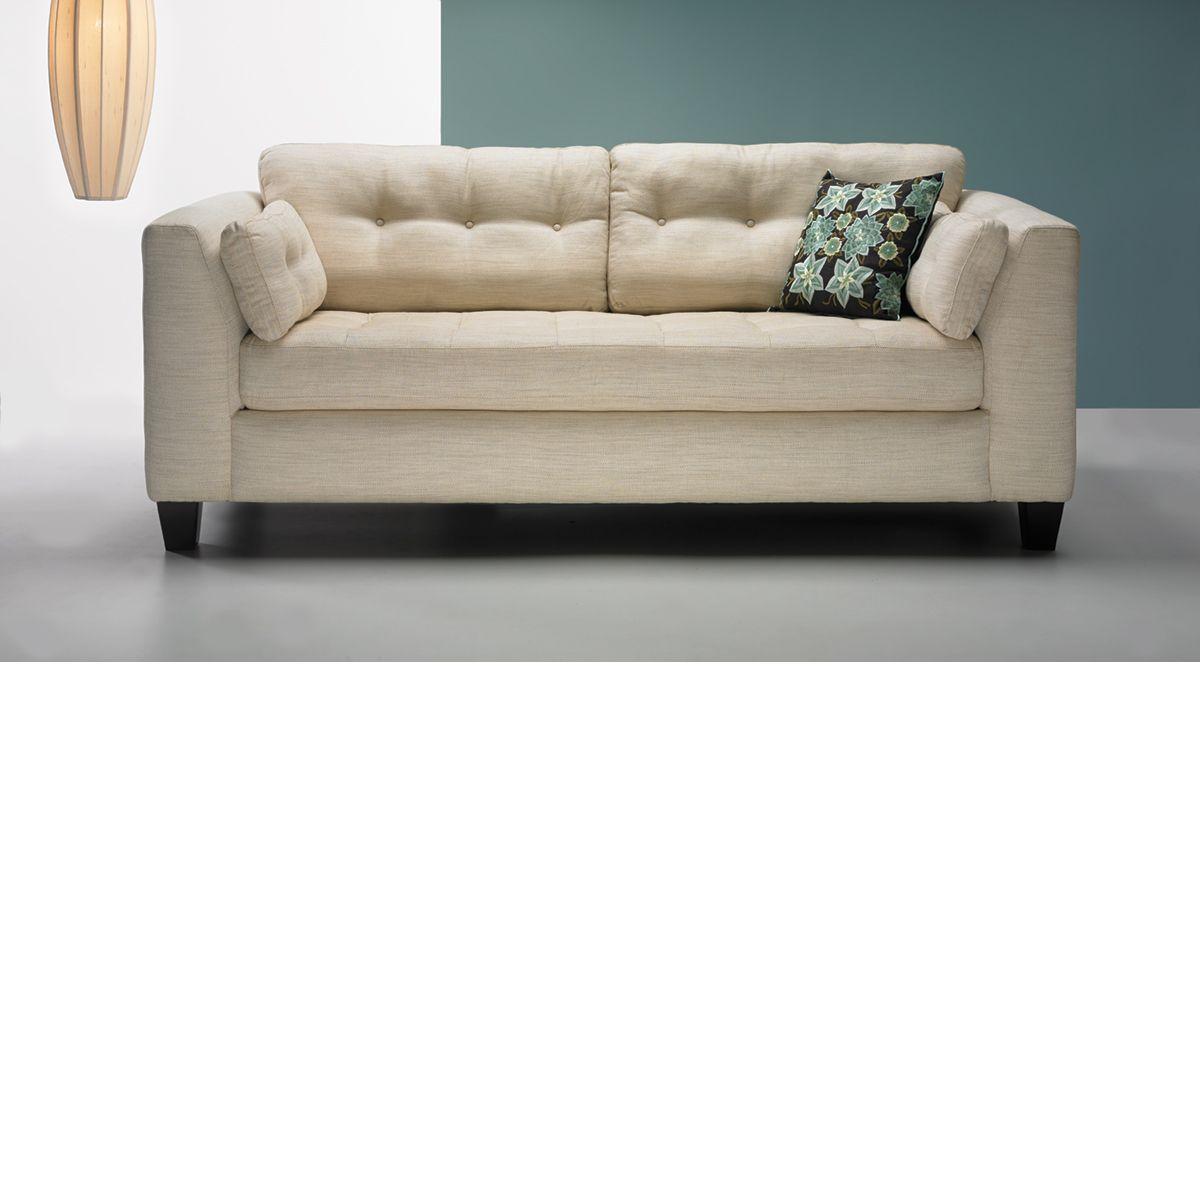 The Dump Furniture - MARLOW SOFA | Furniture | Pinterest | Dump ...